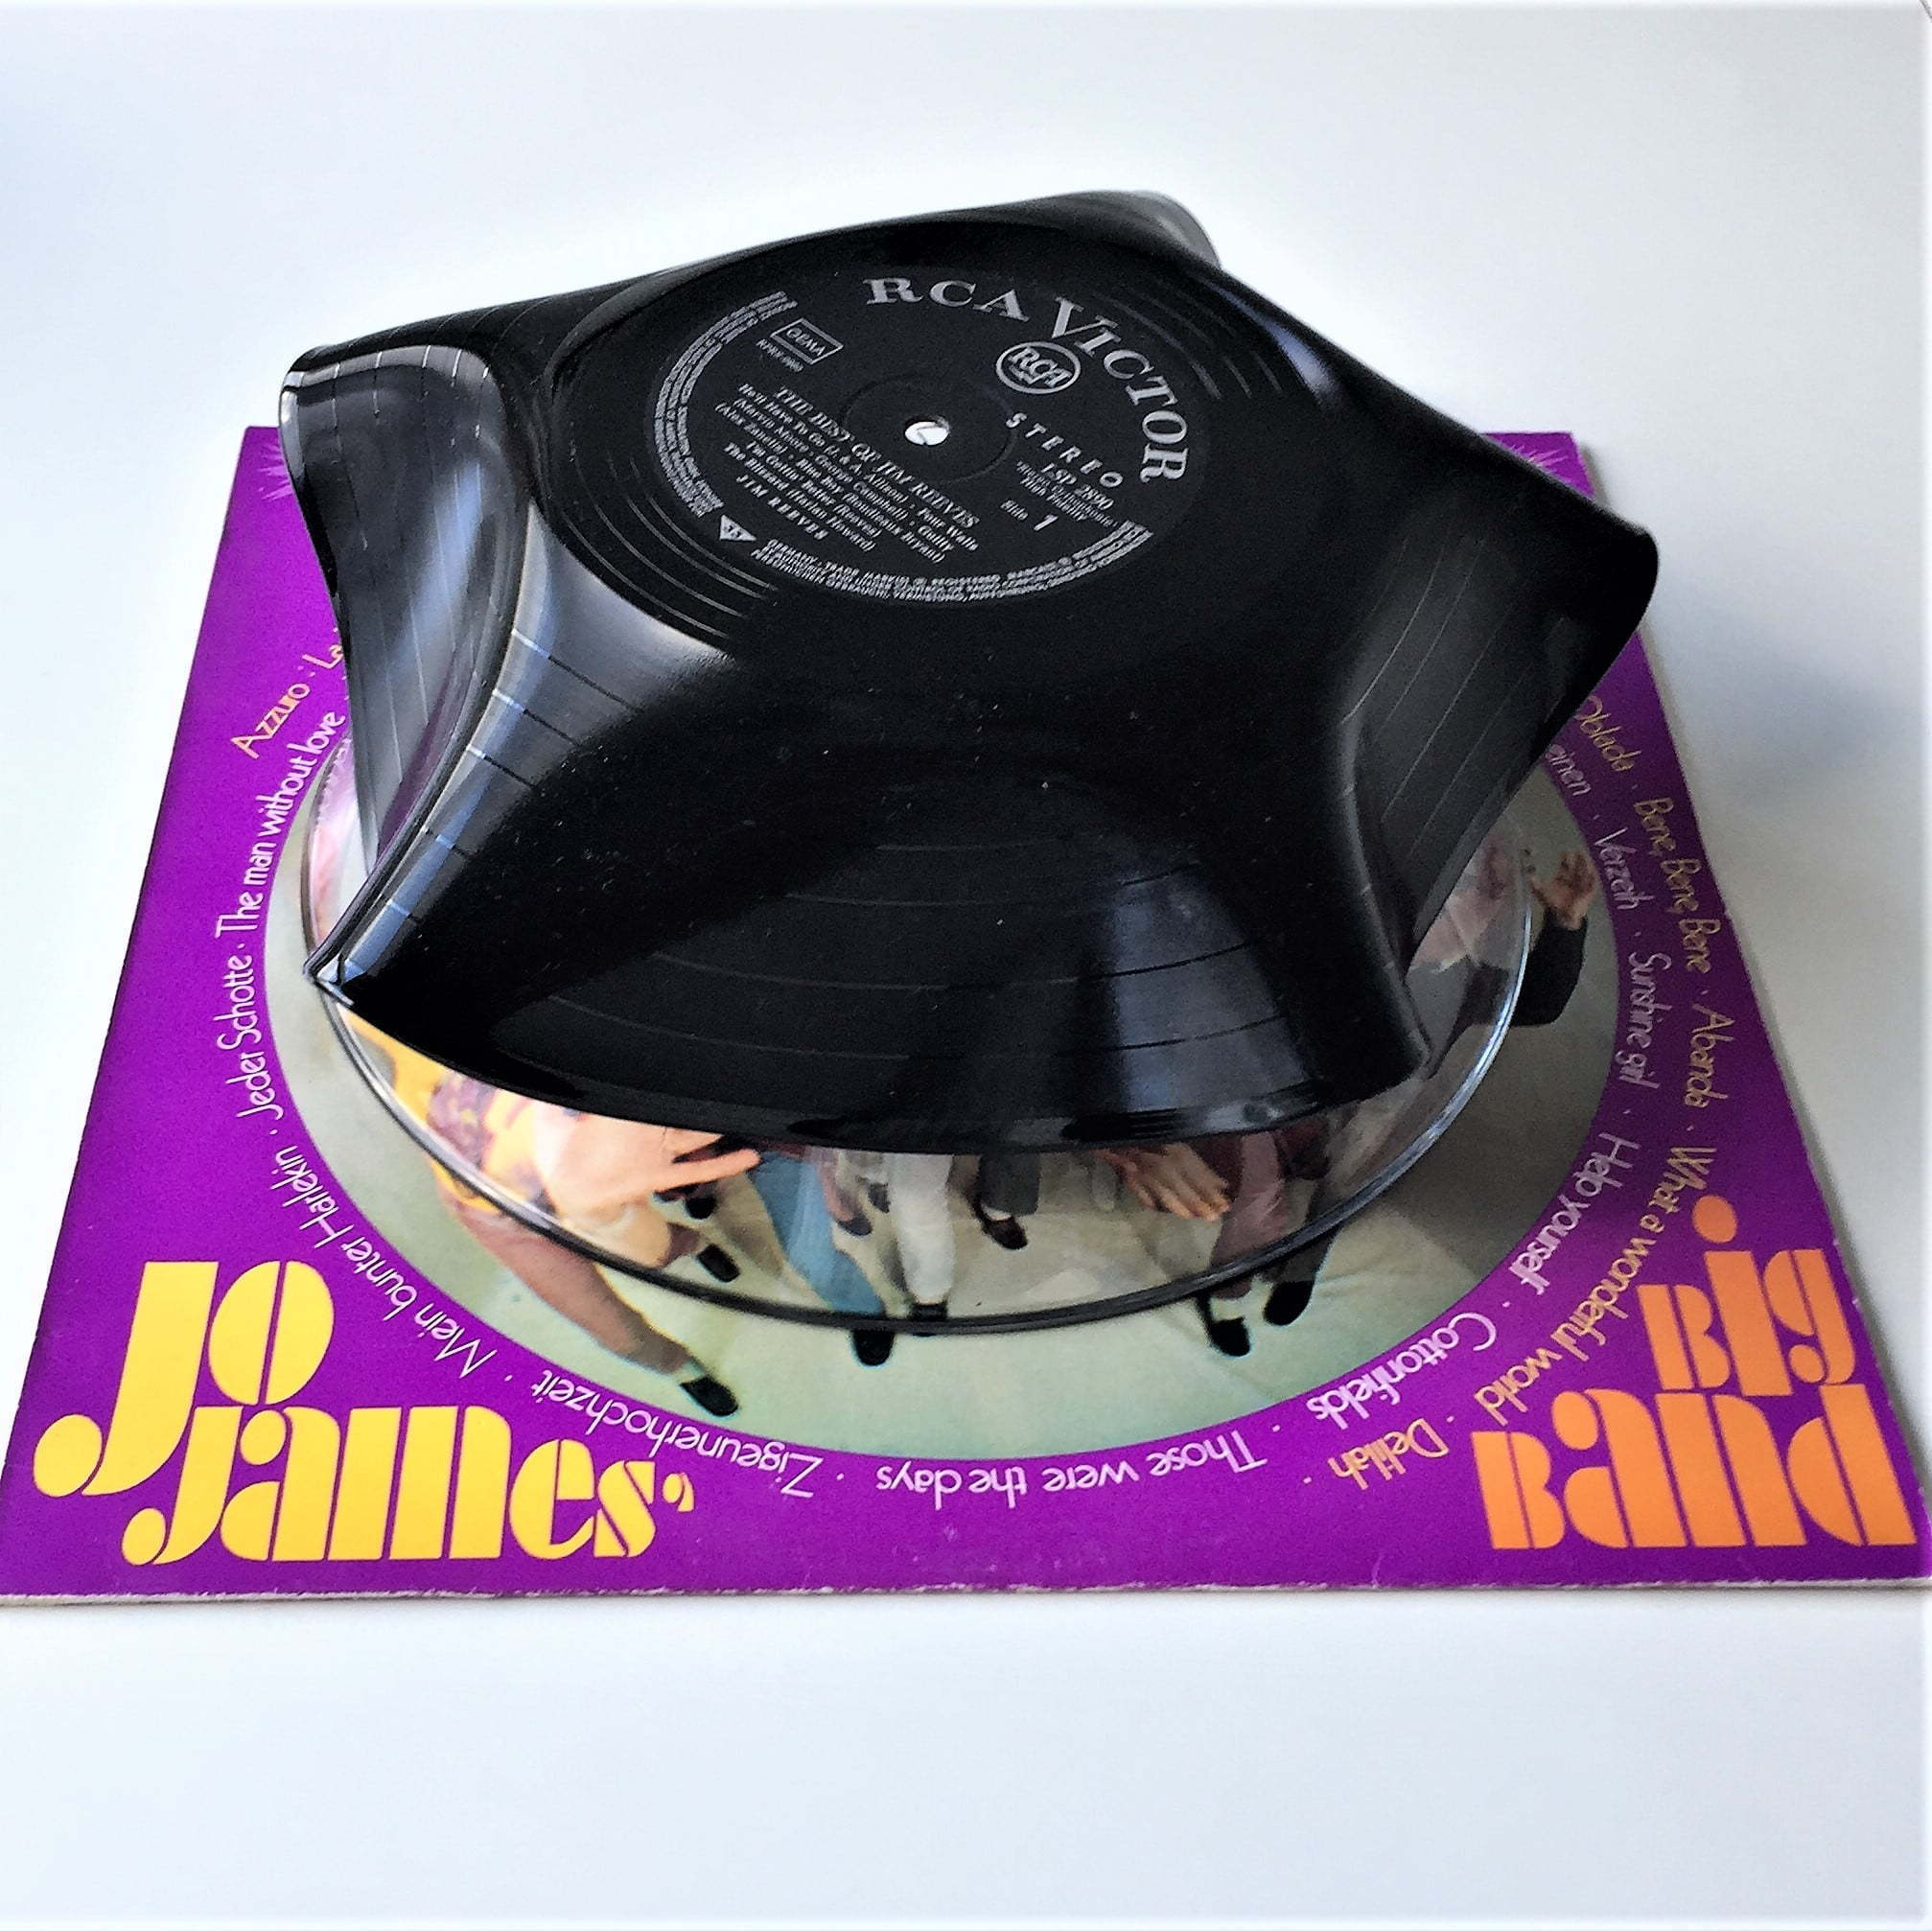 grammofonplade skl mgp 3